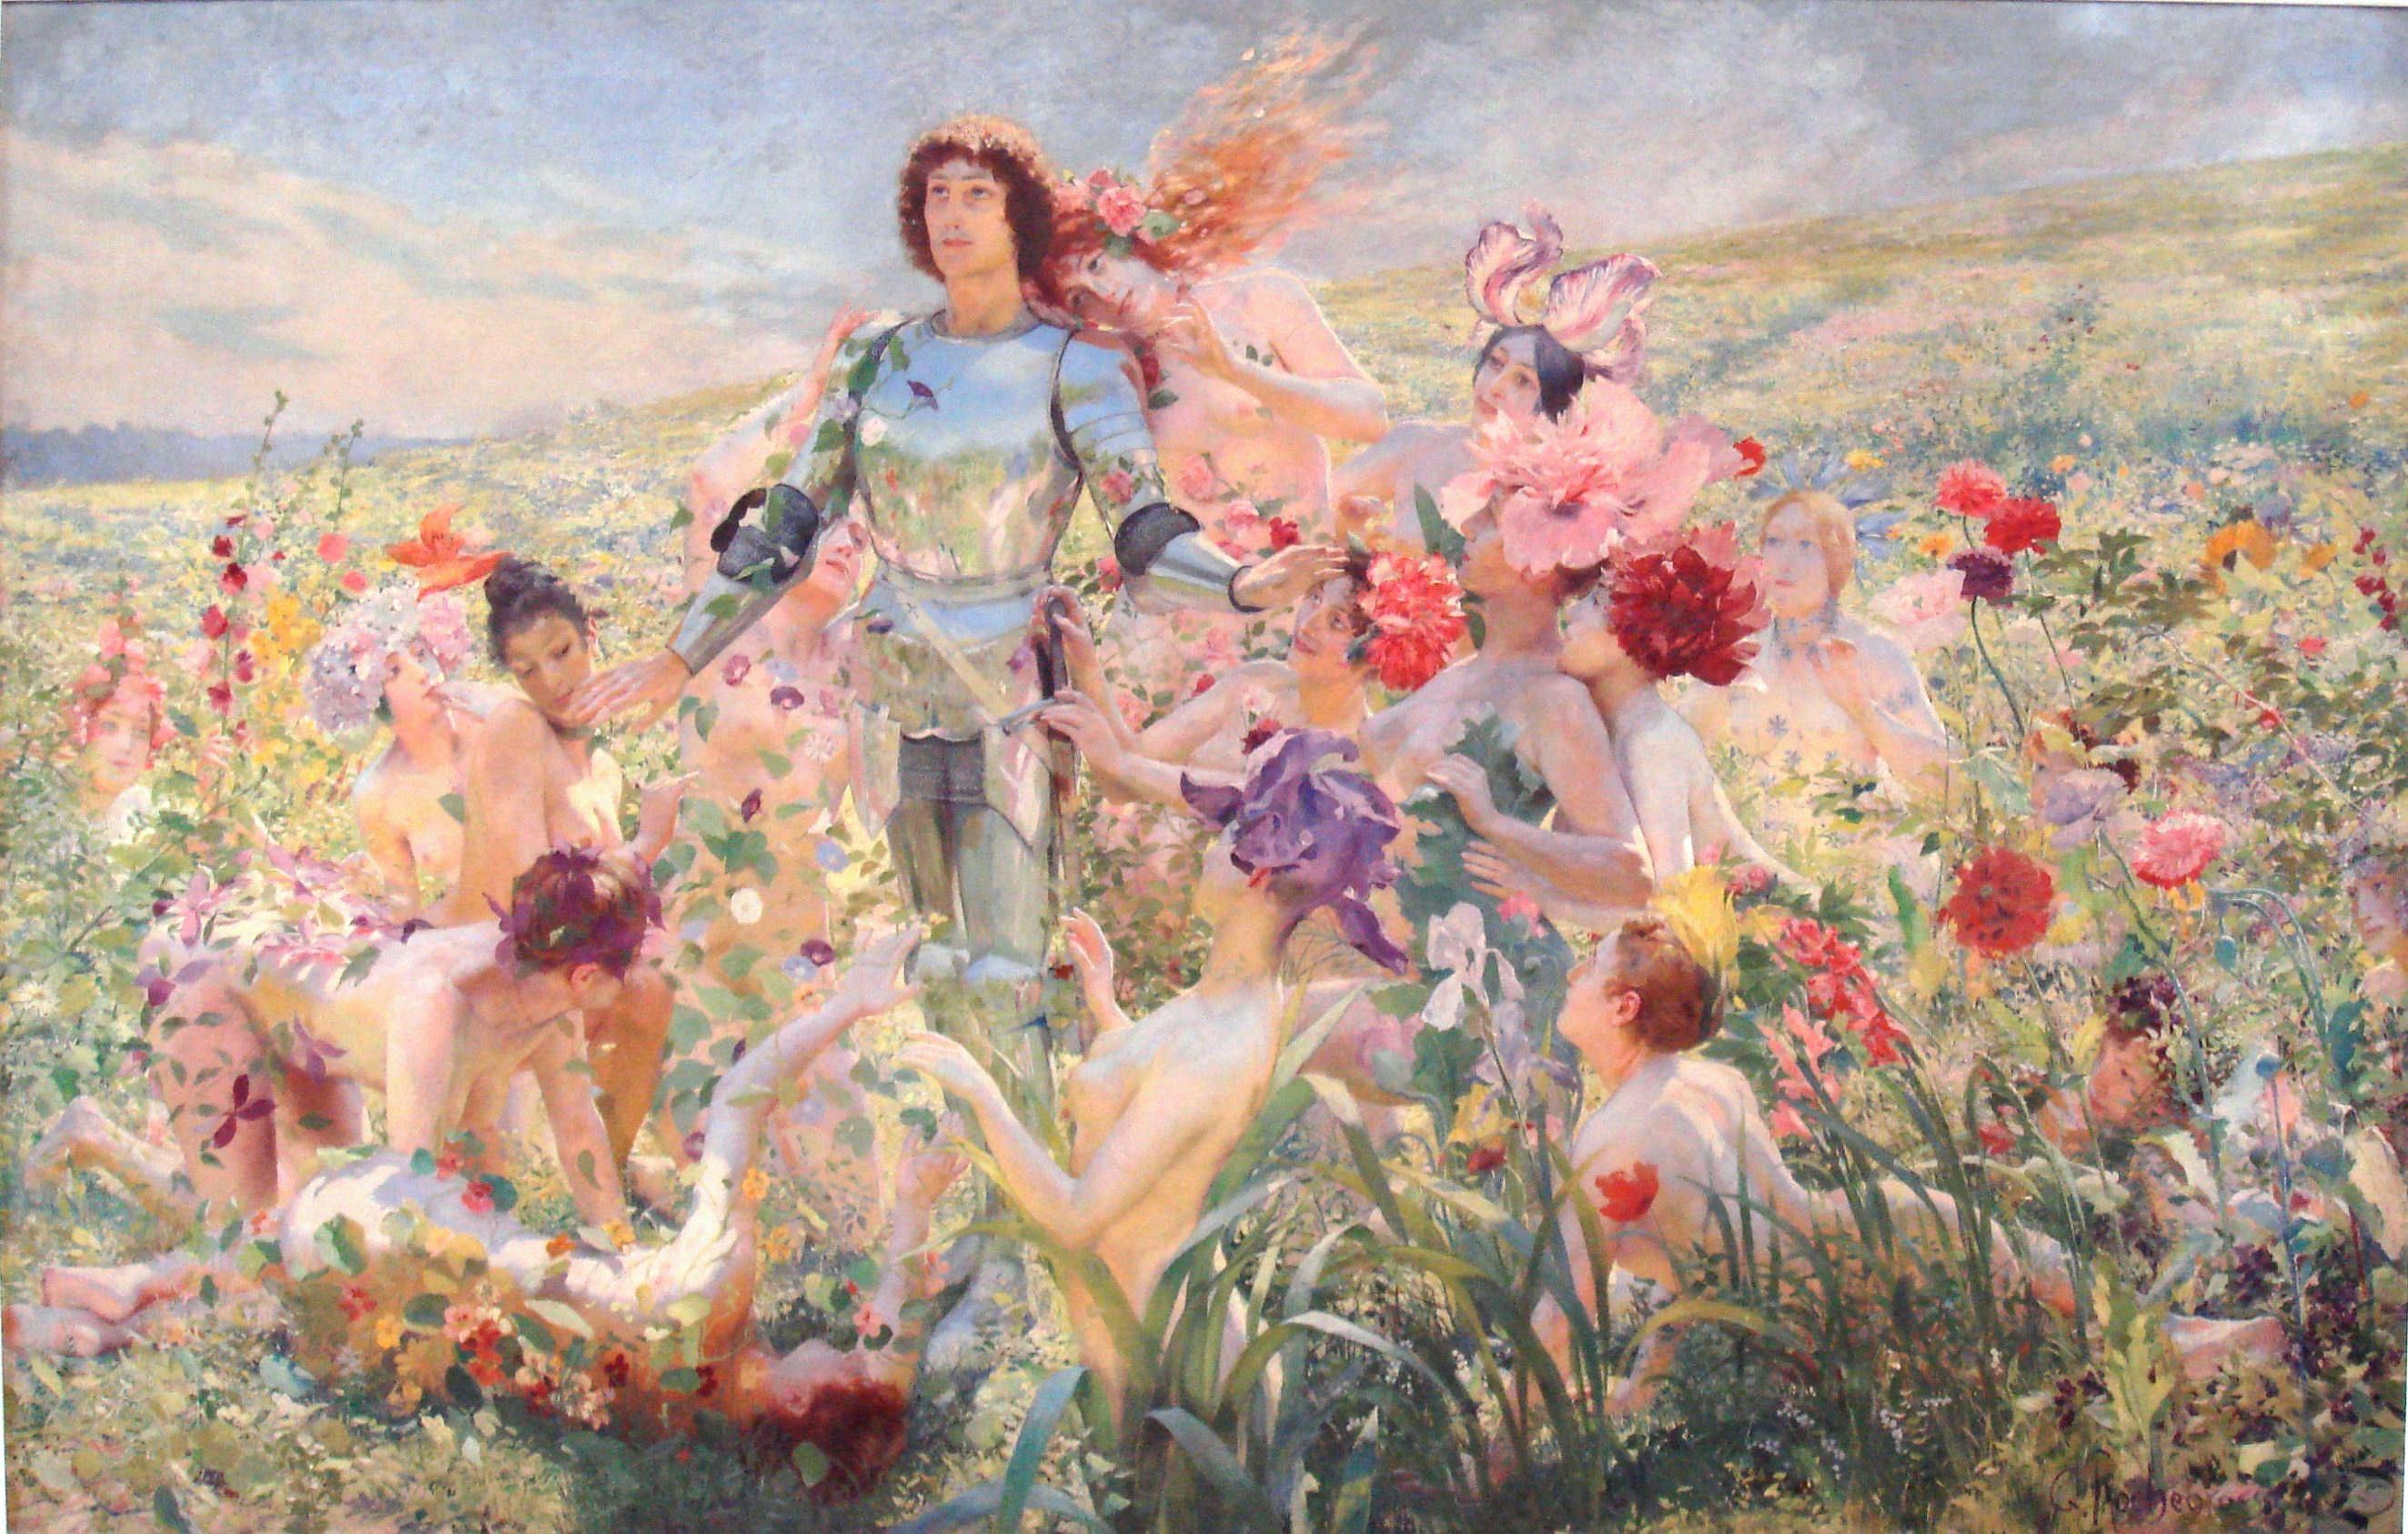 Le_Chevalier_aux_Fleurs_1894_Georges_Rochegrosse Musee Orsay